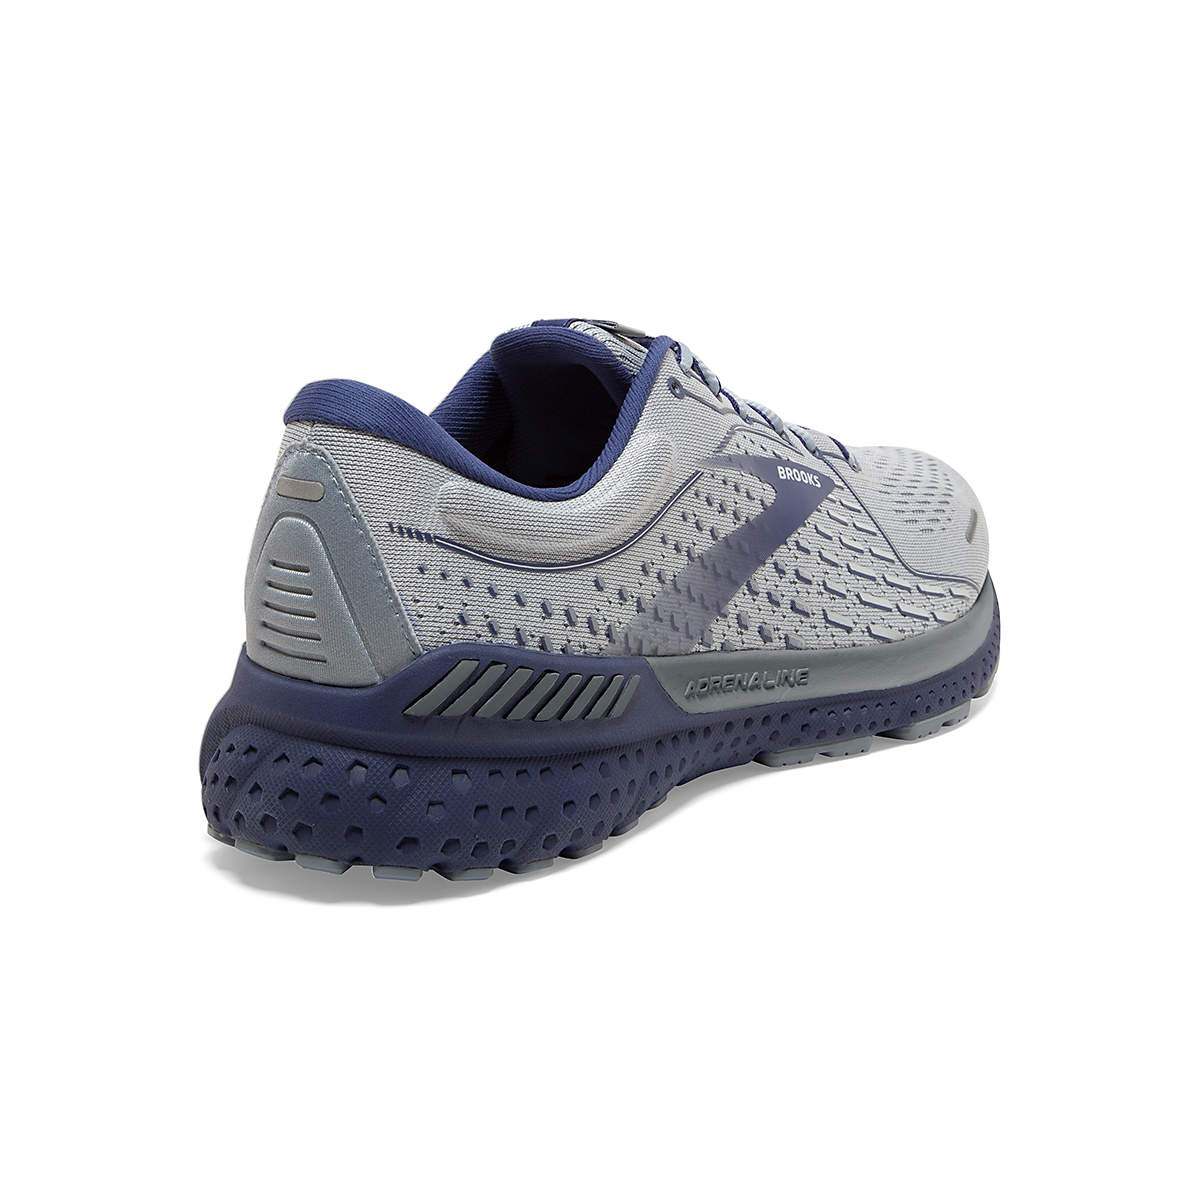 Men's Brooks Adrenaline GTS 21 Running Shoe - Color: Grey/Tradewinds - Size: 7 - Width: Regular, Grey/Tradewinds, large, image 4